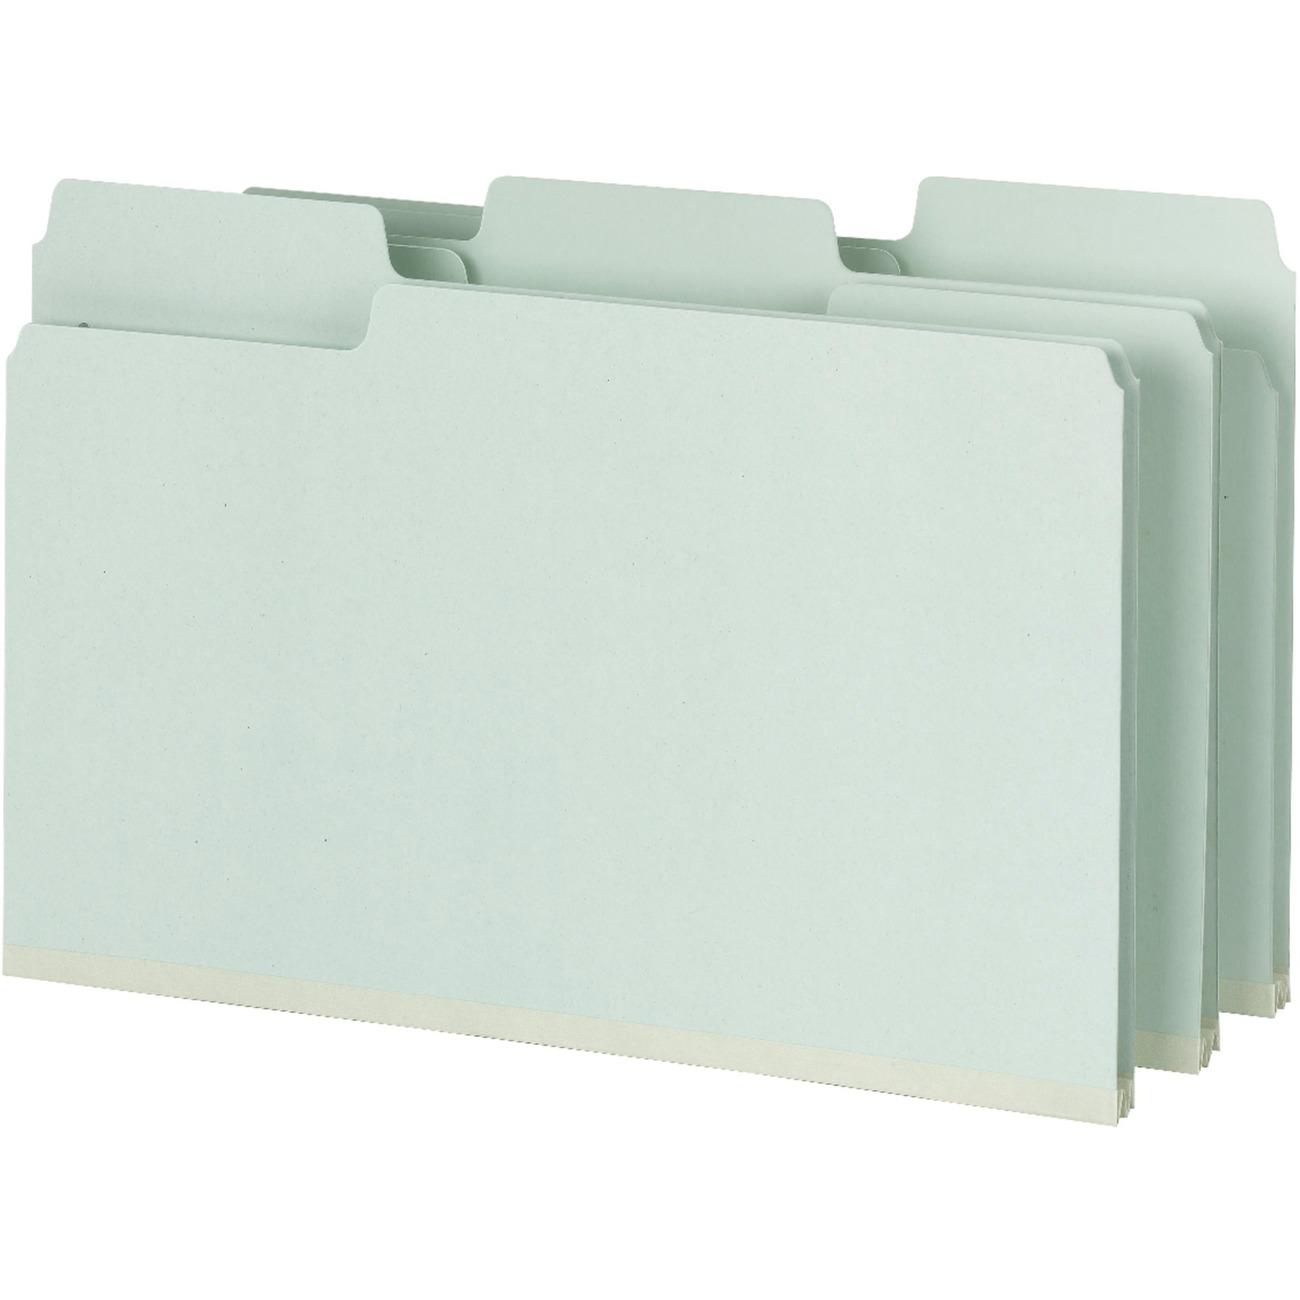 SMD19981 Smead SuperTab Pressboard Fastener Folders with SafeSHIELD Fasteners